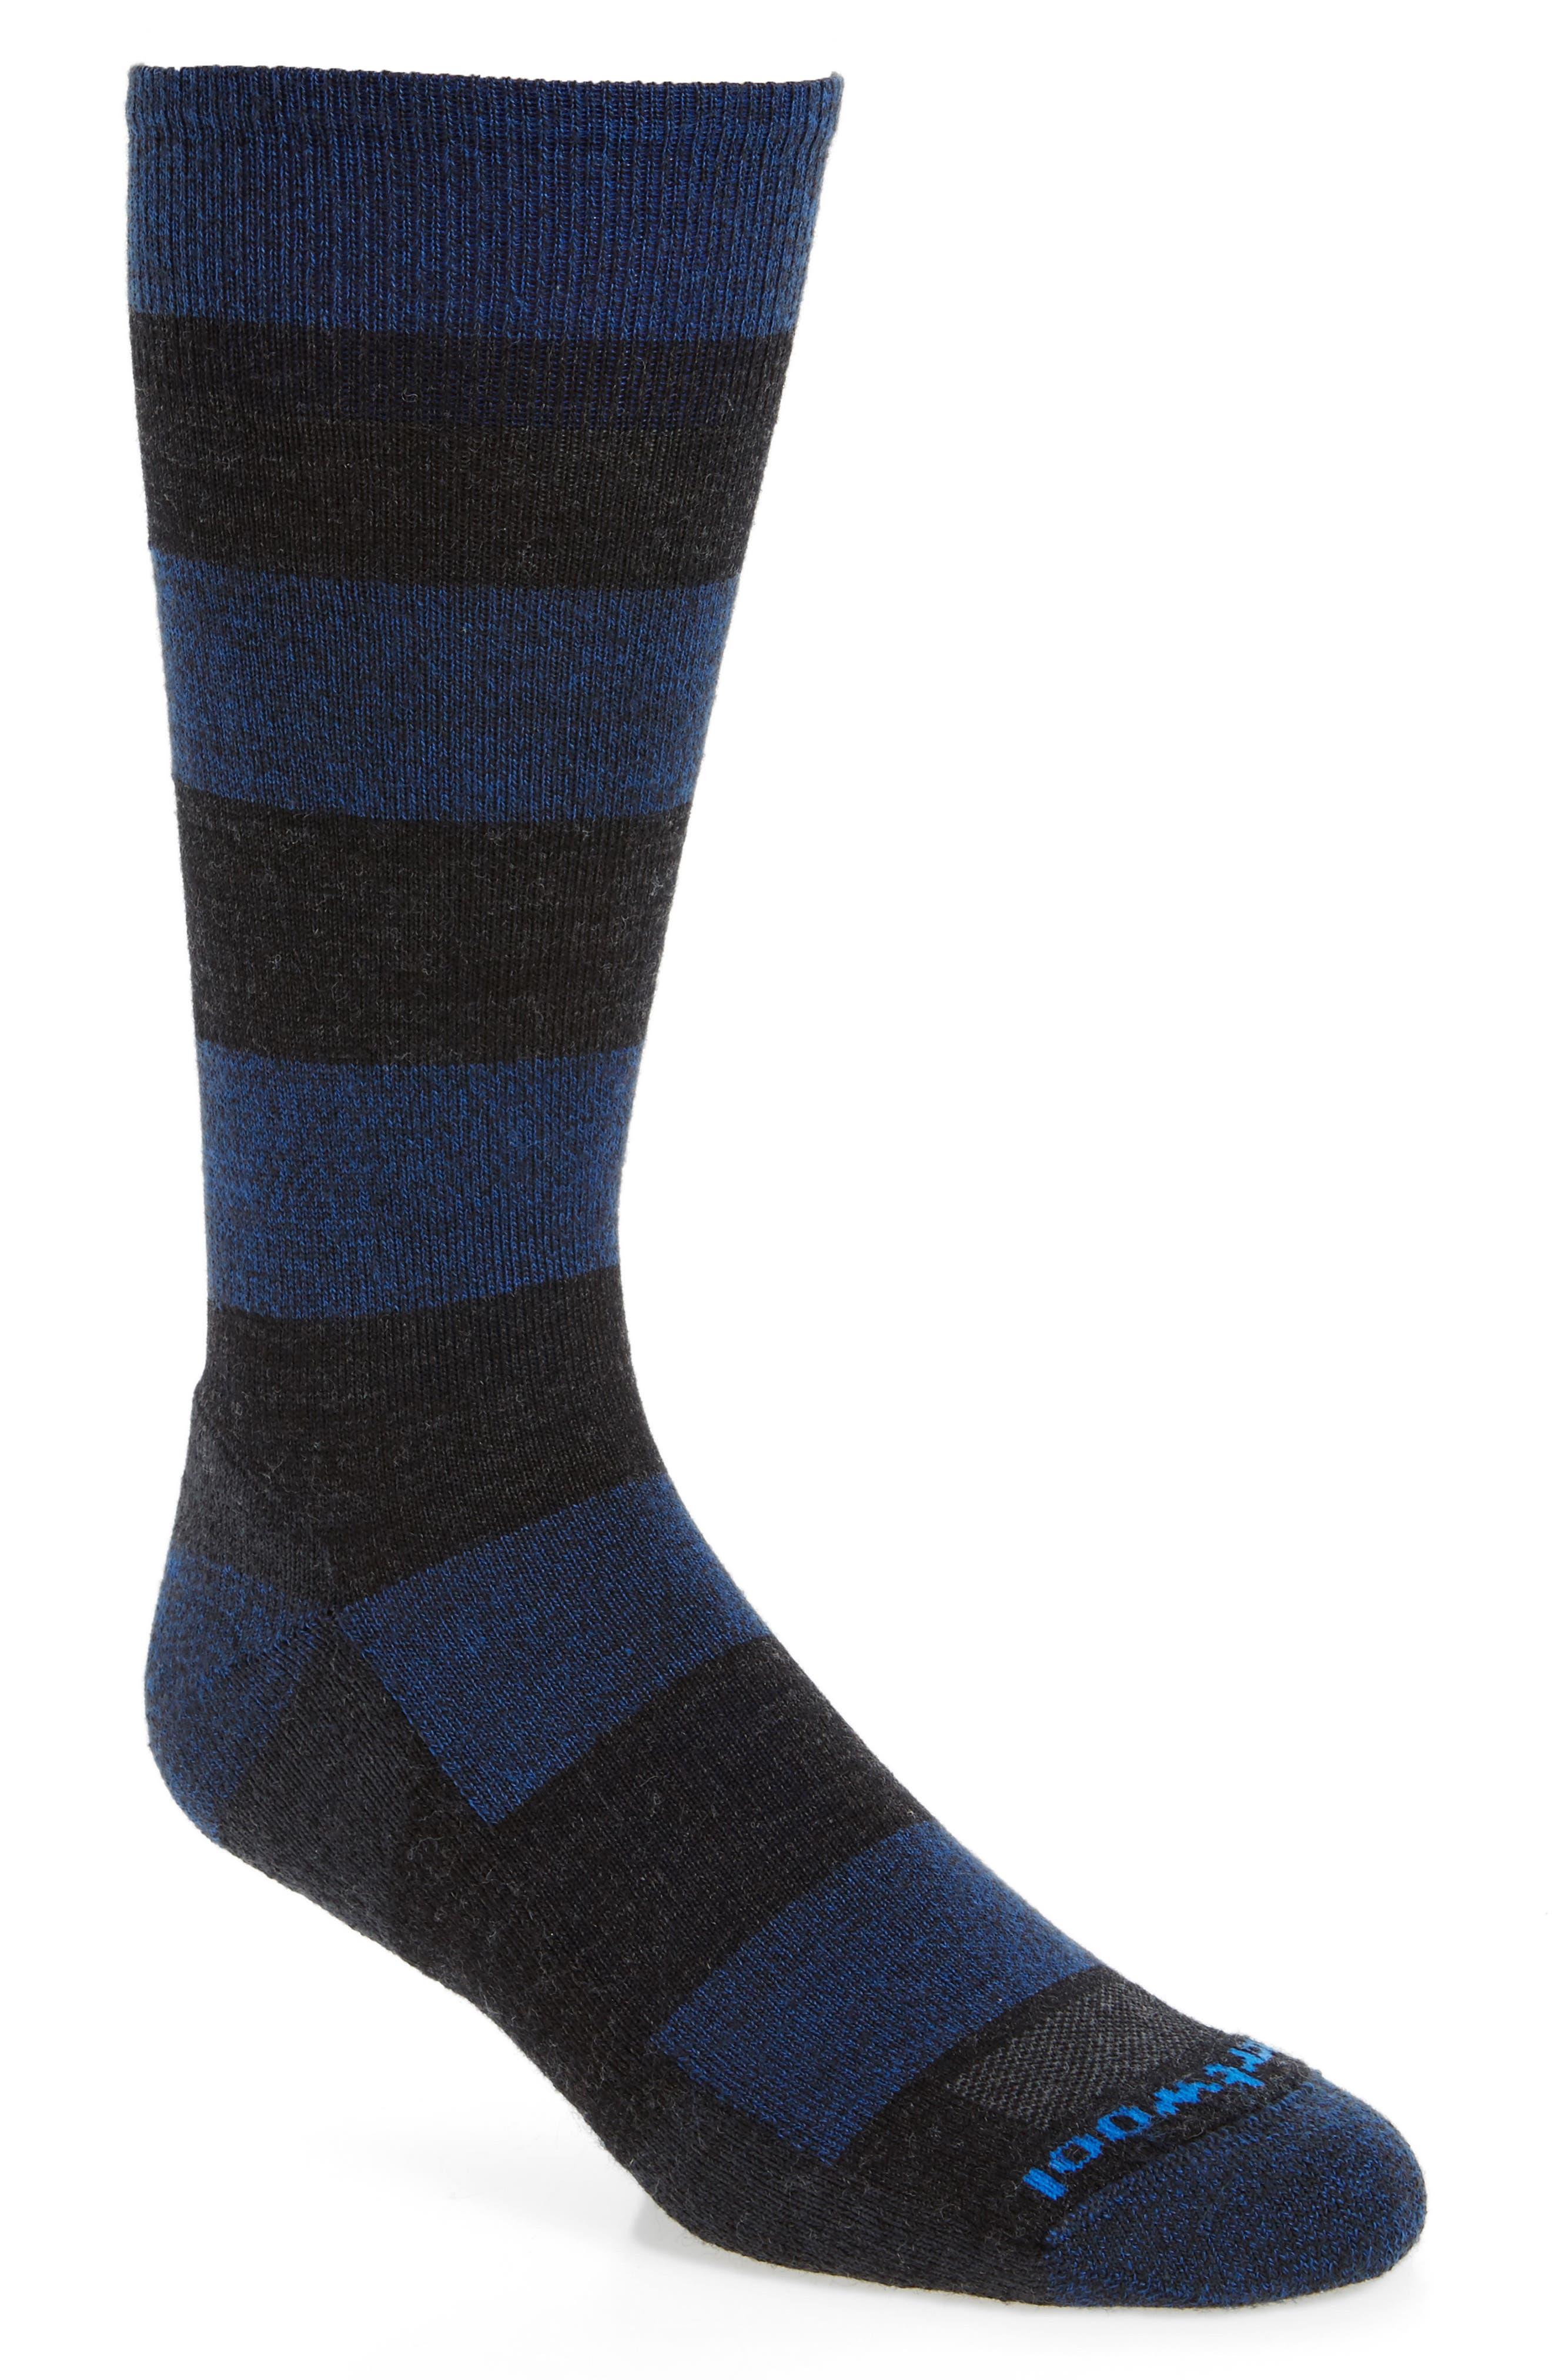 Alternate Image 1 Selected - Smartwool Gimsby Stripe Socks